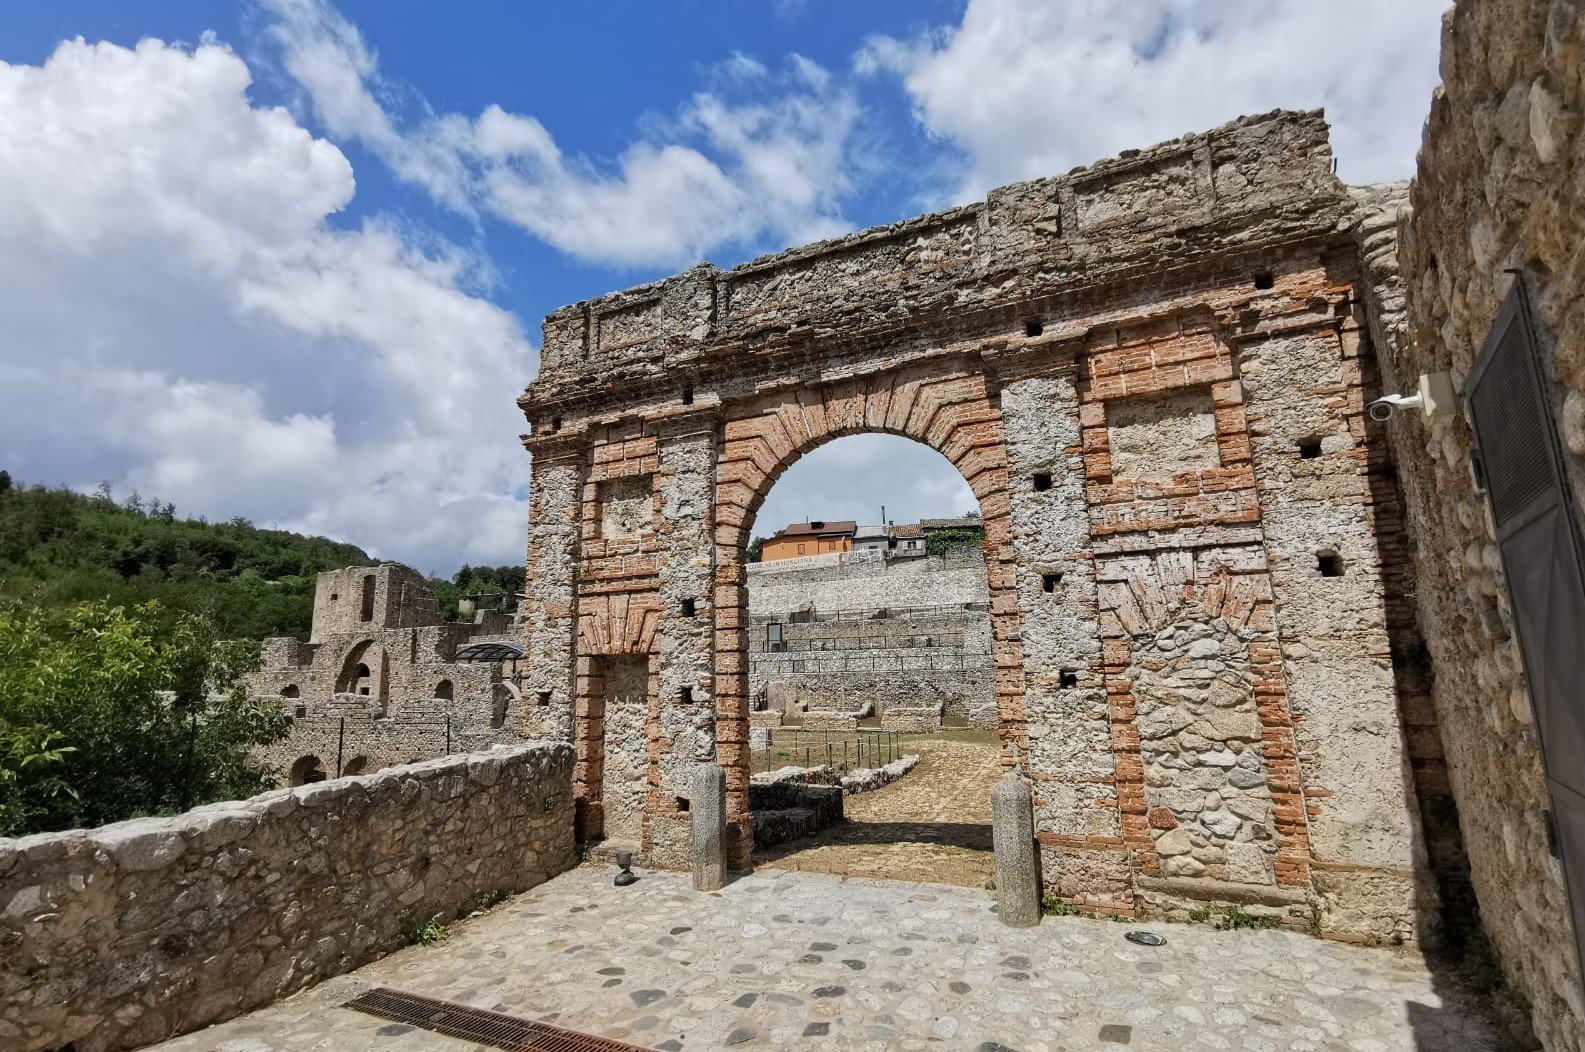 ingresso antica fonderia di Mongiana in Calabria